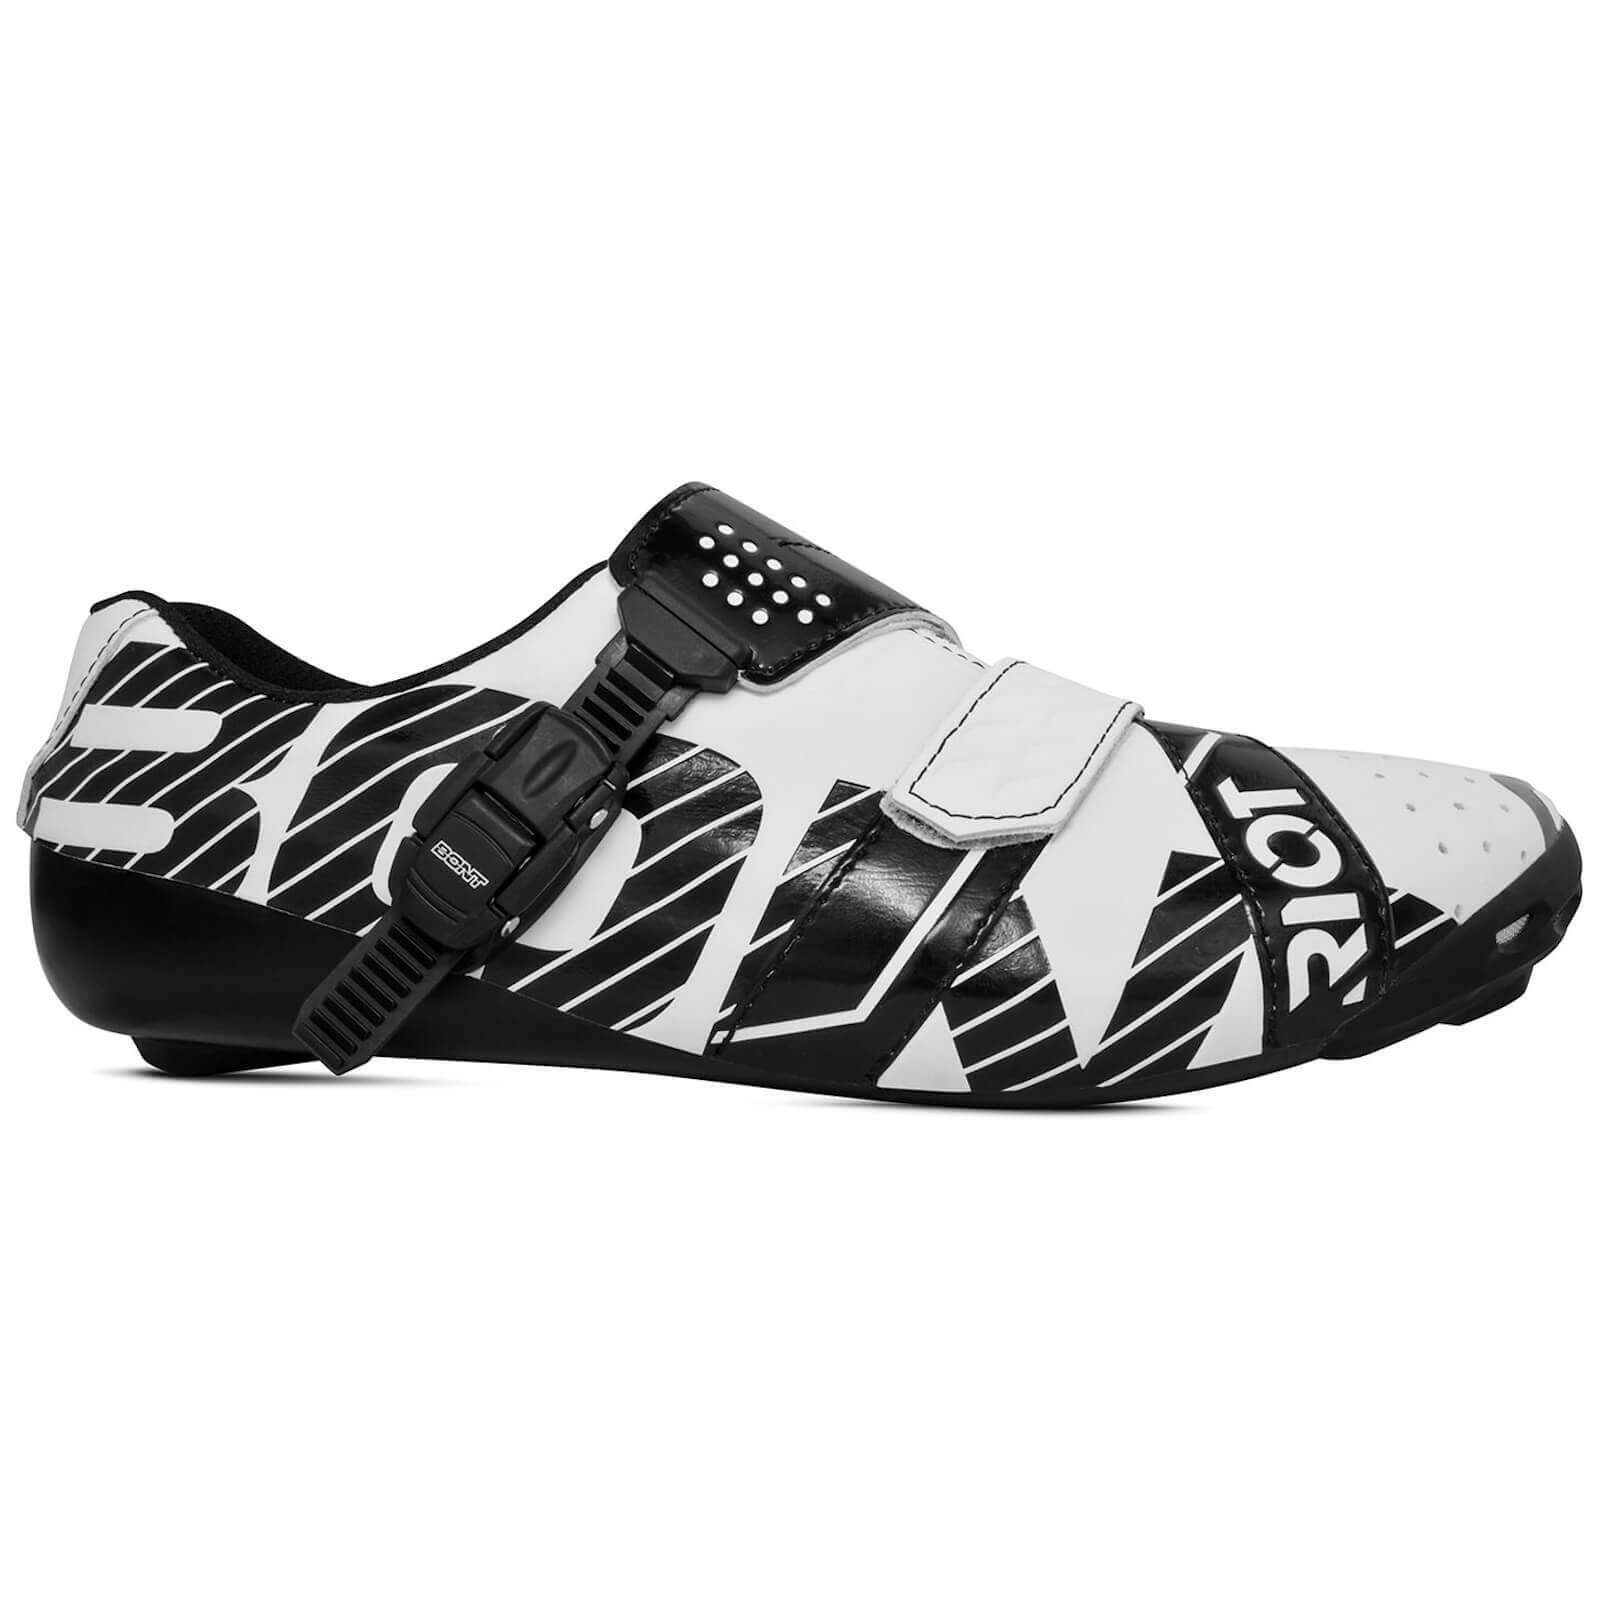 Bont Riot Road Shoes - EU 43 - White/Black